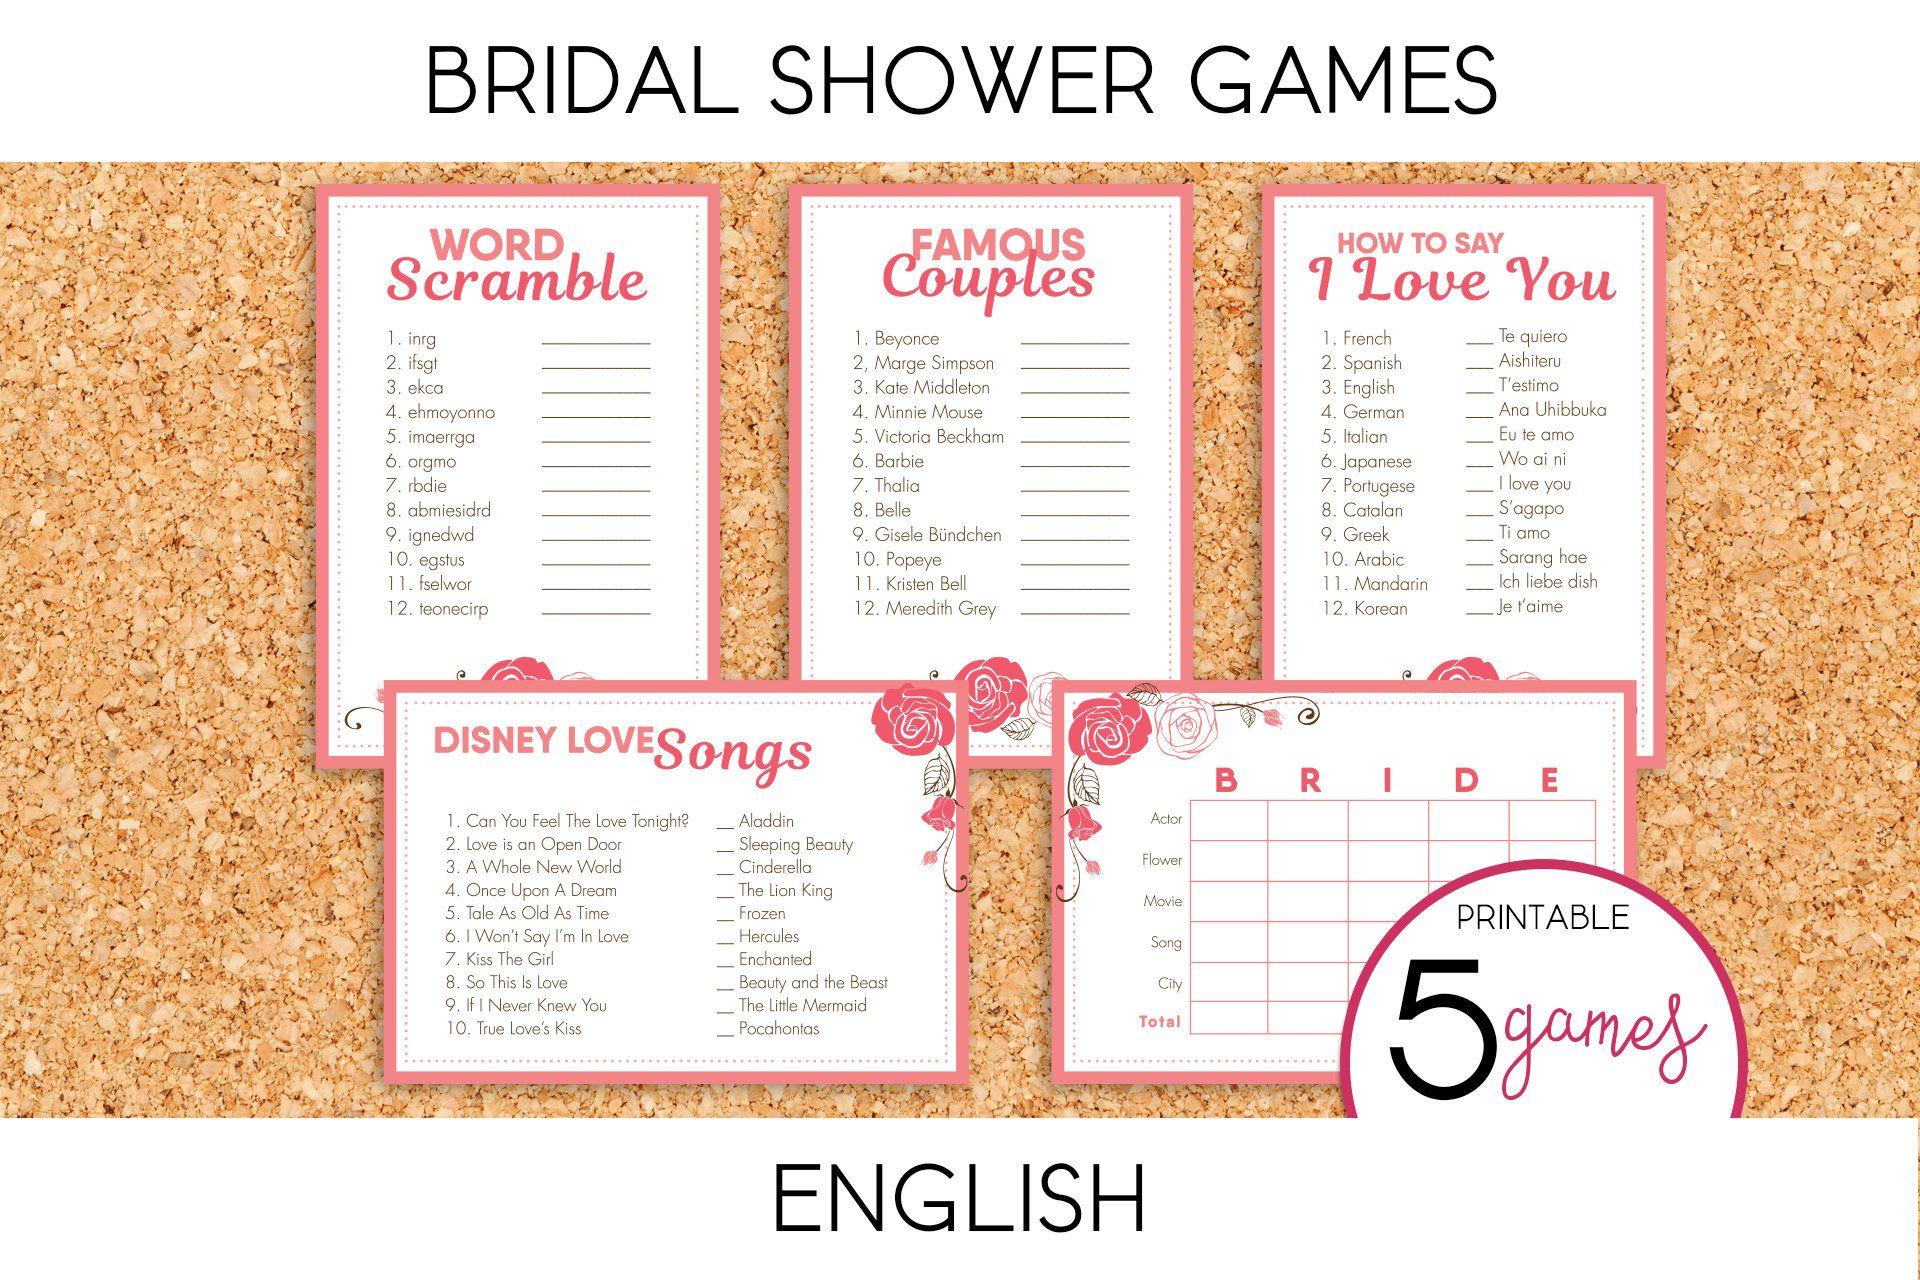 Bridal Shower Bachelorette Games